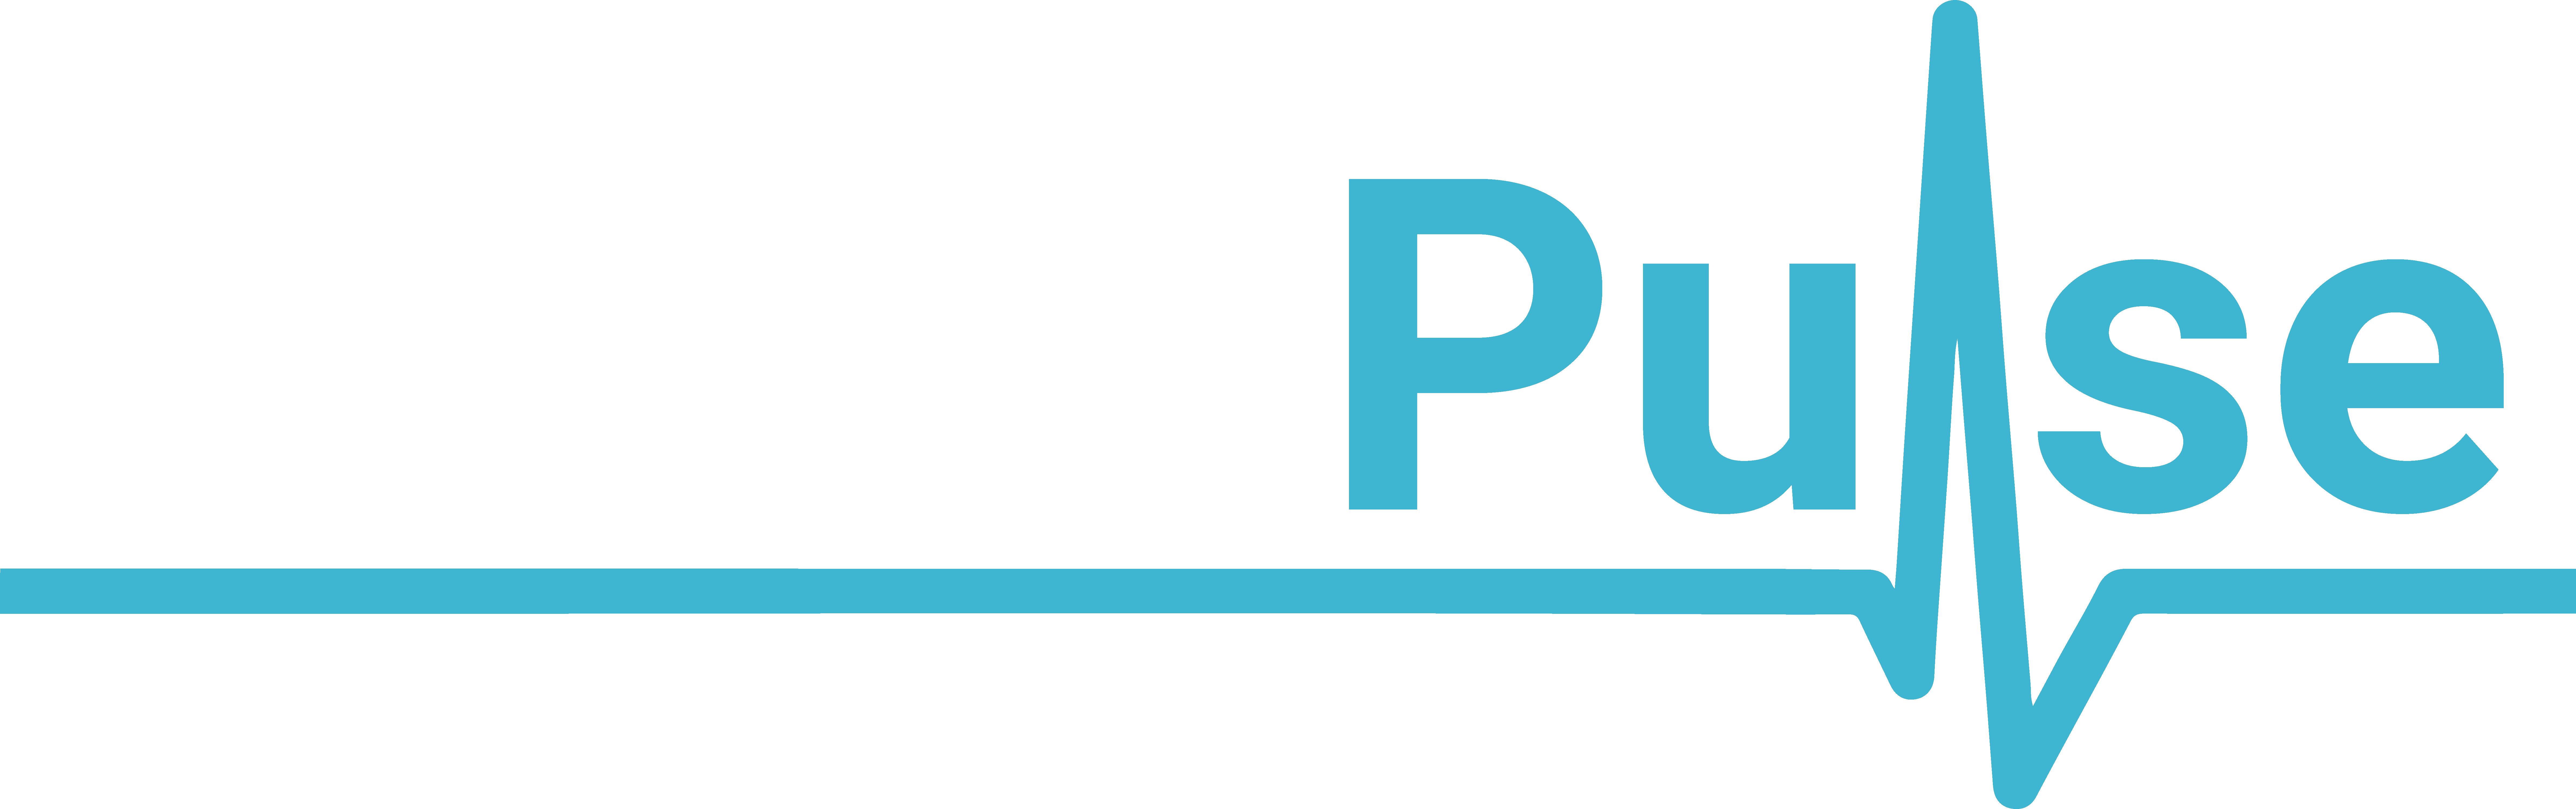 RehabPulse logo with white and blue text.